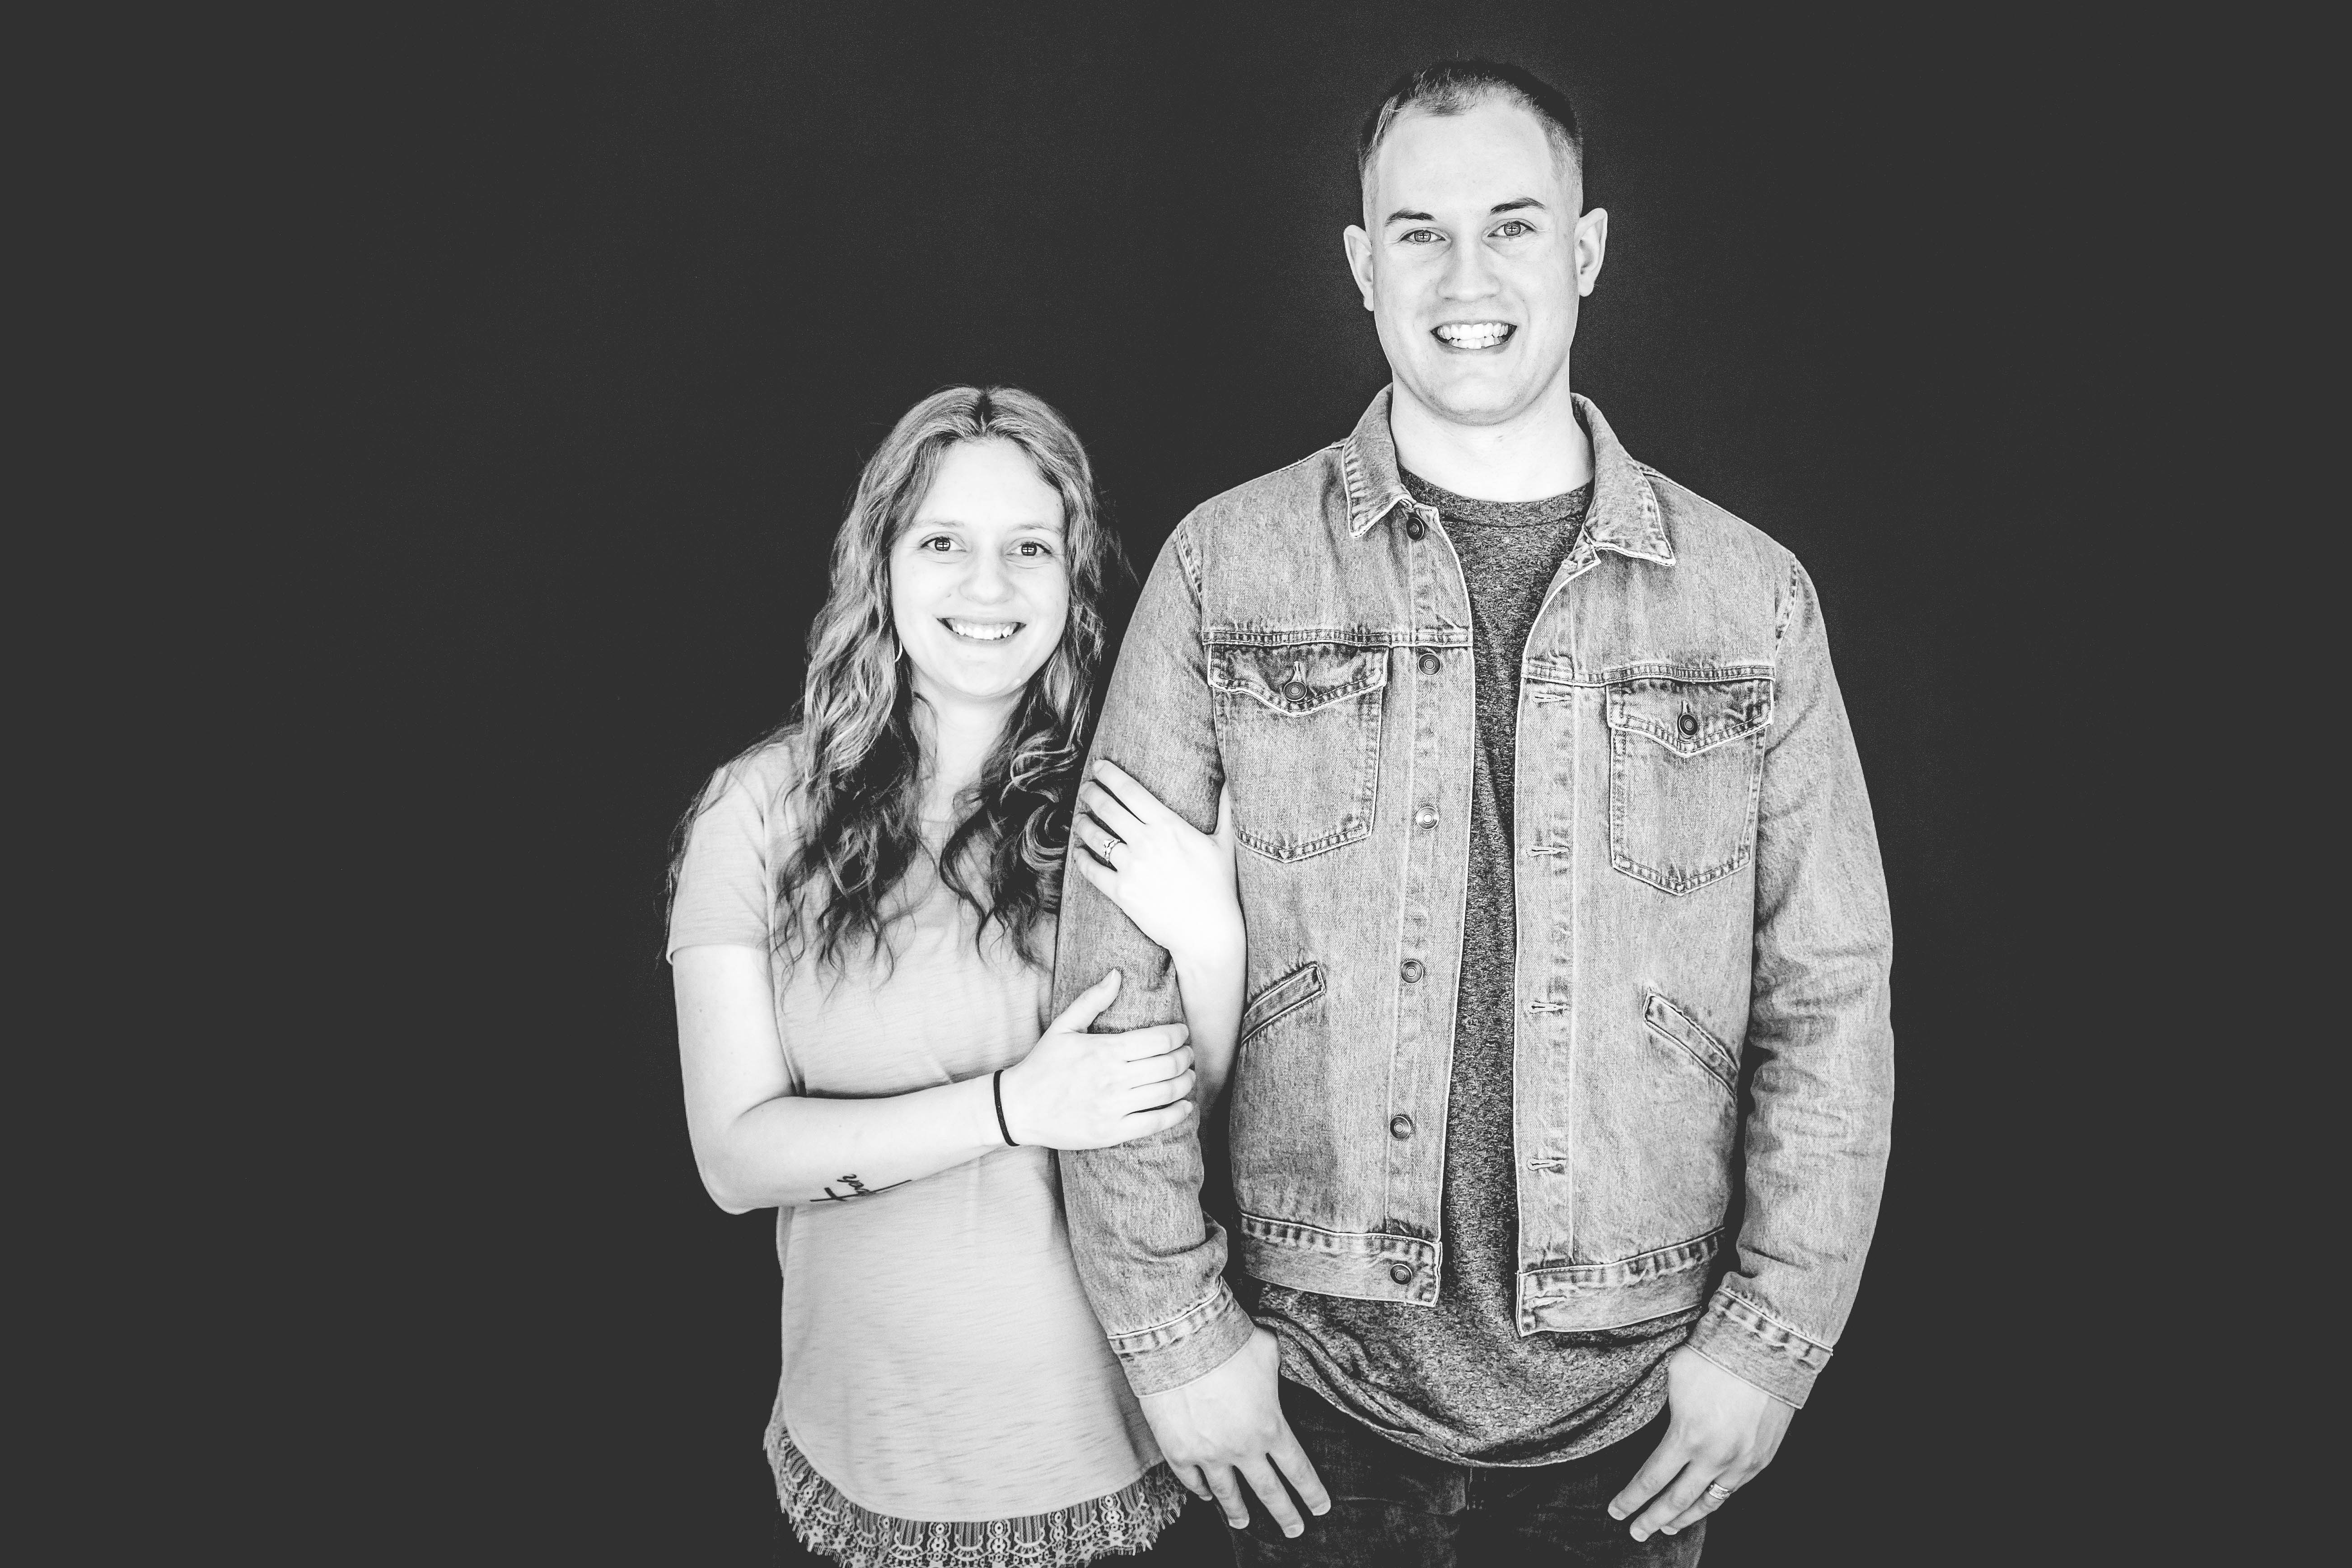 Pastors Spencer and Sarah Green